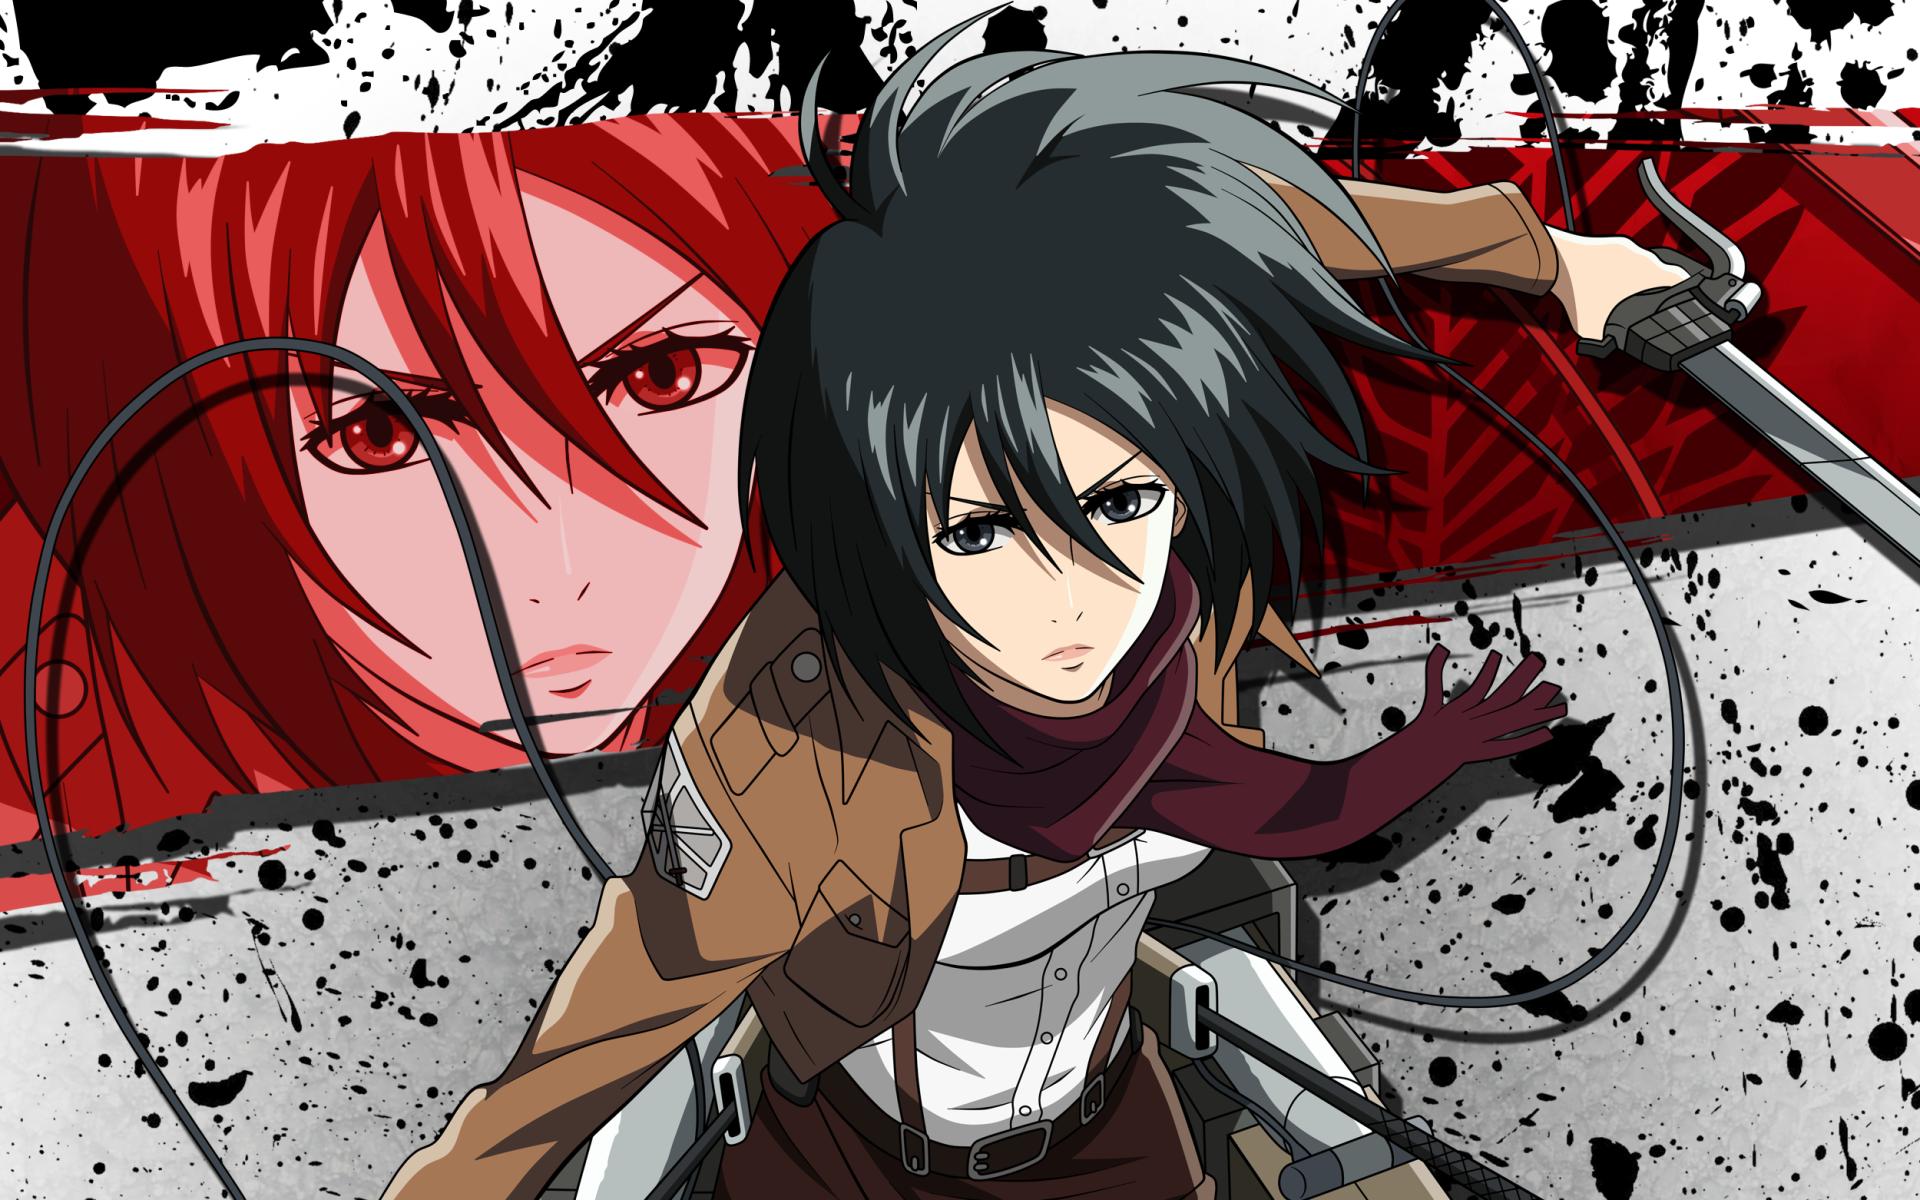 Anime Attack On Titan Eren Yeager Shingeki No Kyojin